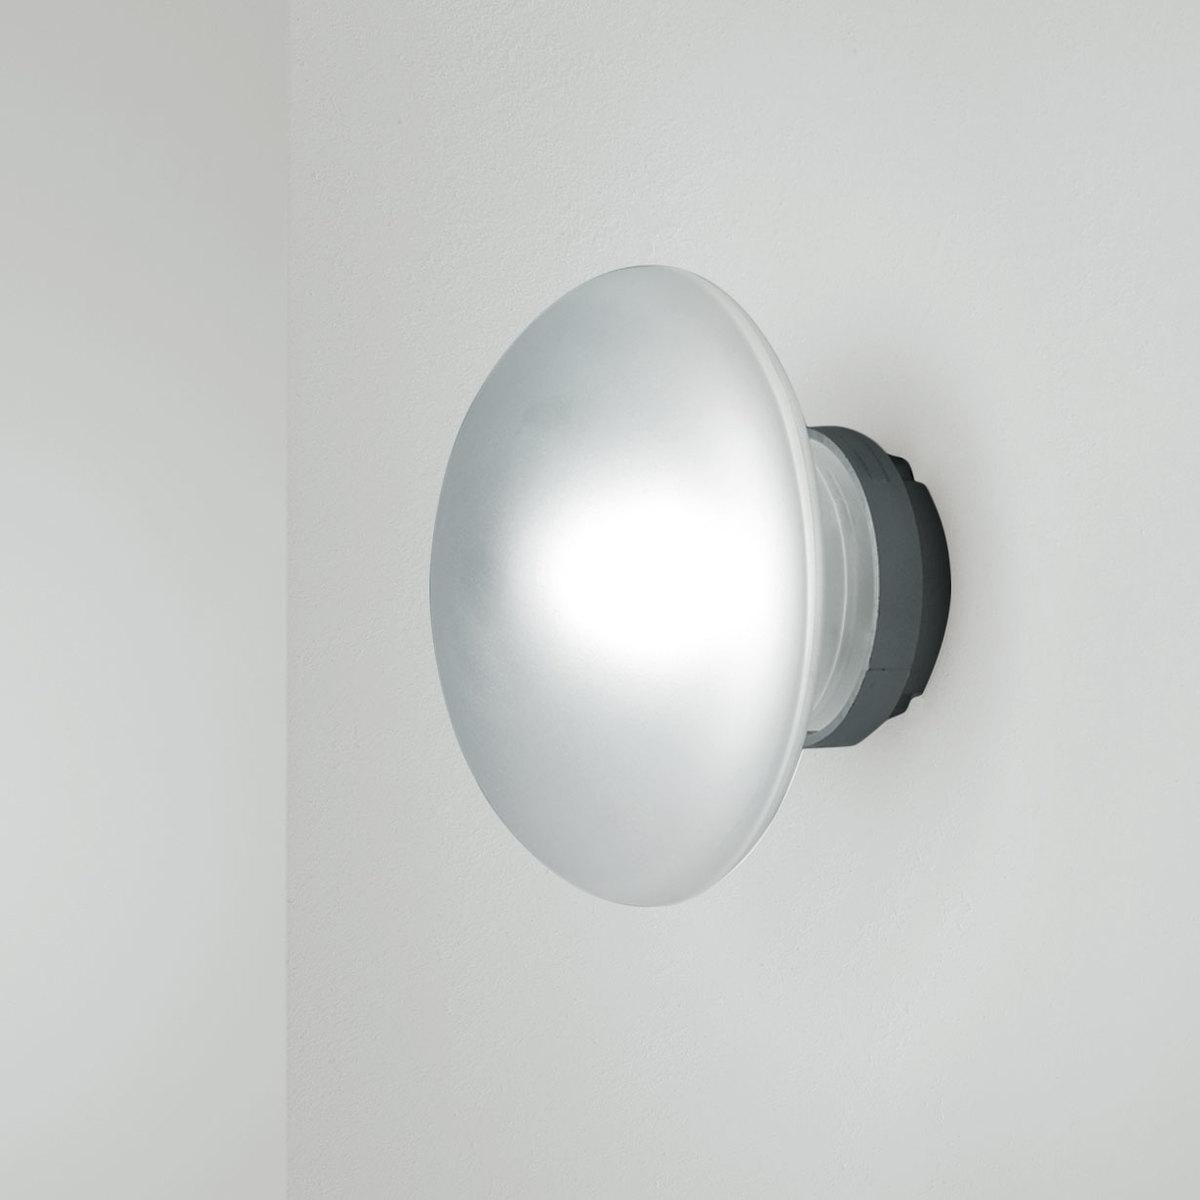 Lampada da parete sillaba by fontanaarte lovethesign for Sillaba fontana arte